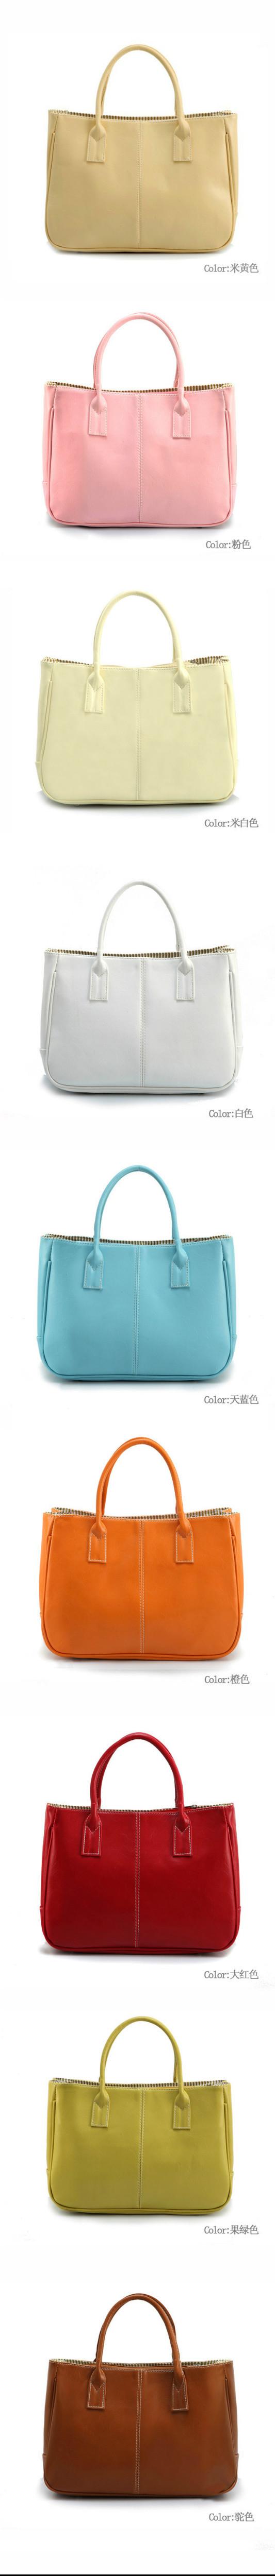 Free shipping Women s Handbag women messenger bags Cross Body Bagi women  leather handbags Wholesale colourful bags for 2015 ae6c123f5b0ec